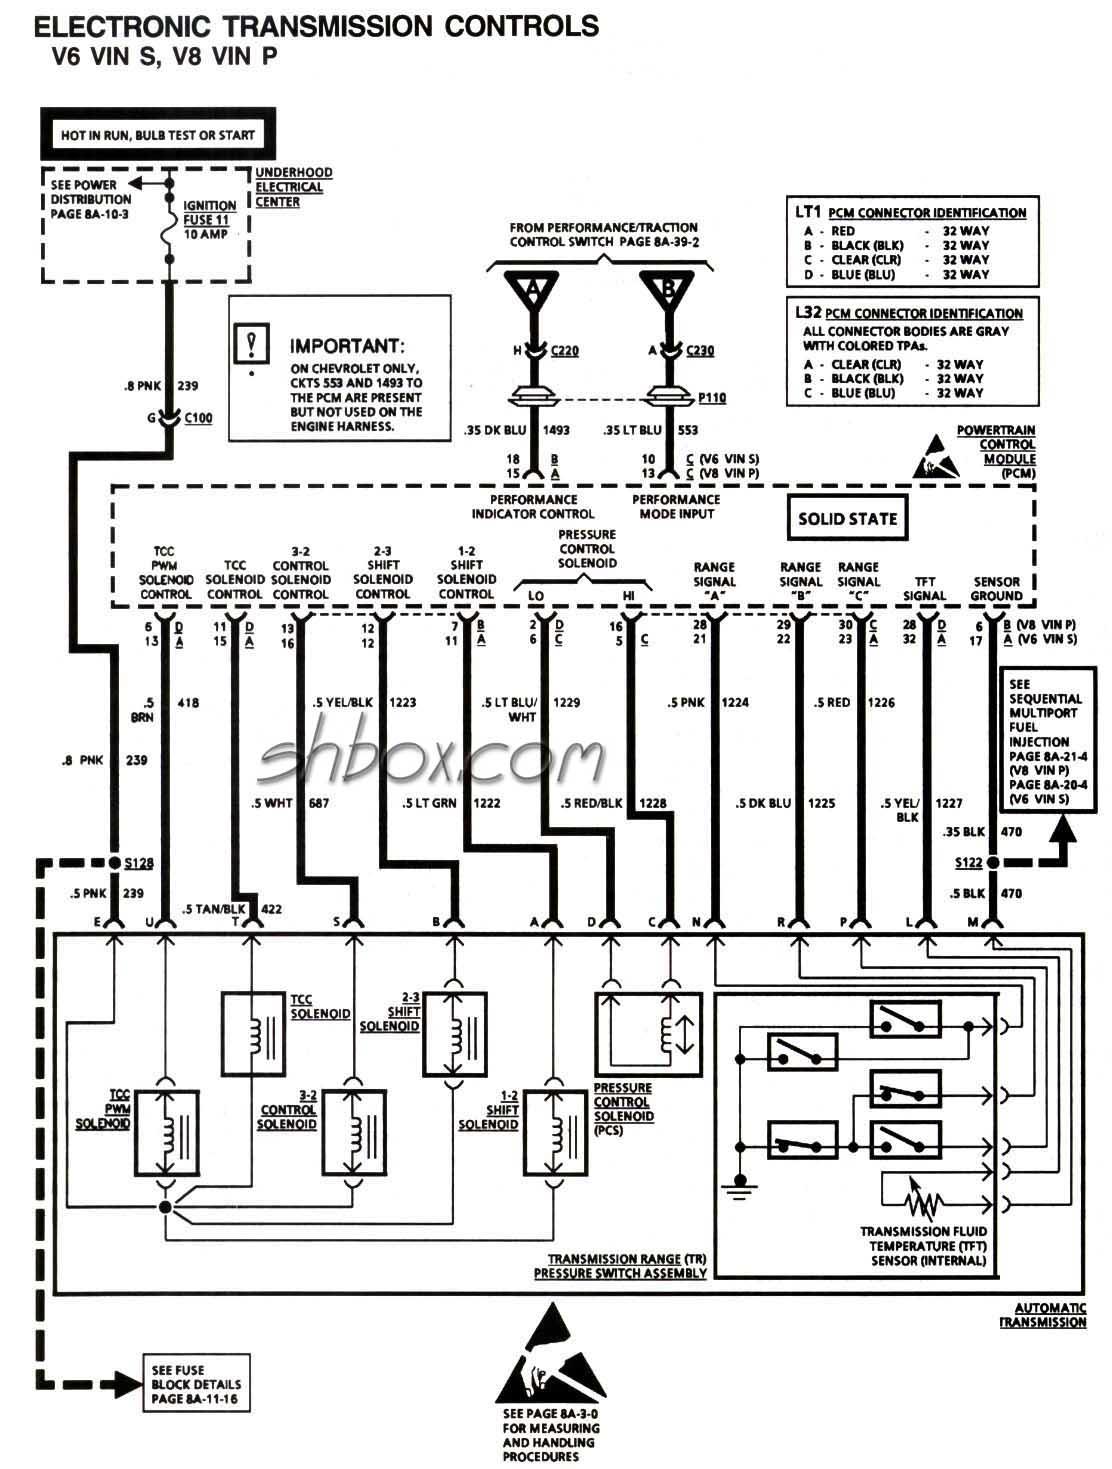 Beautiful Viper 350hv Wiring Diagram Photos - Wiring Diagram Ideas ...